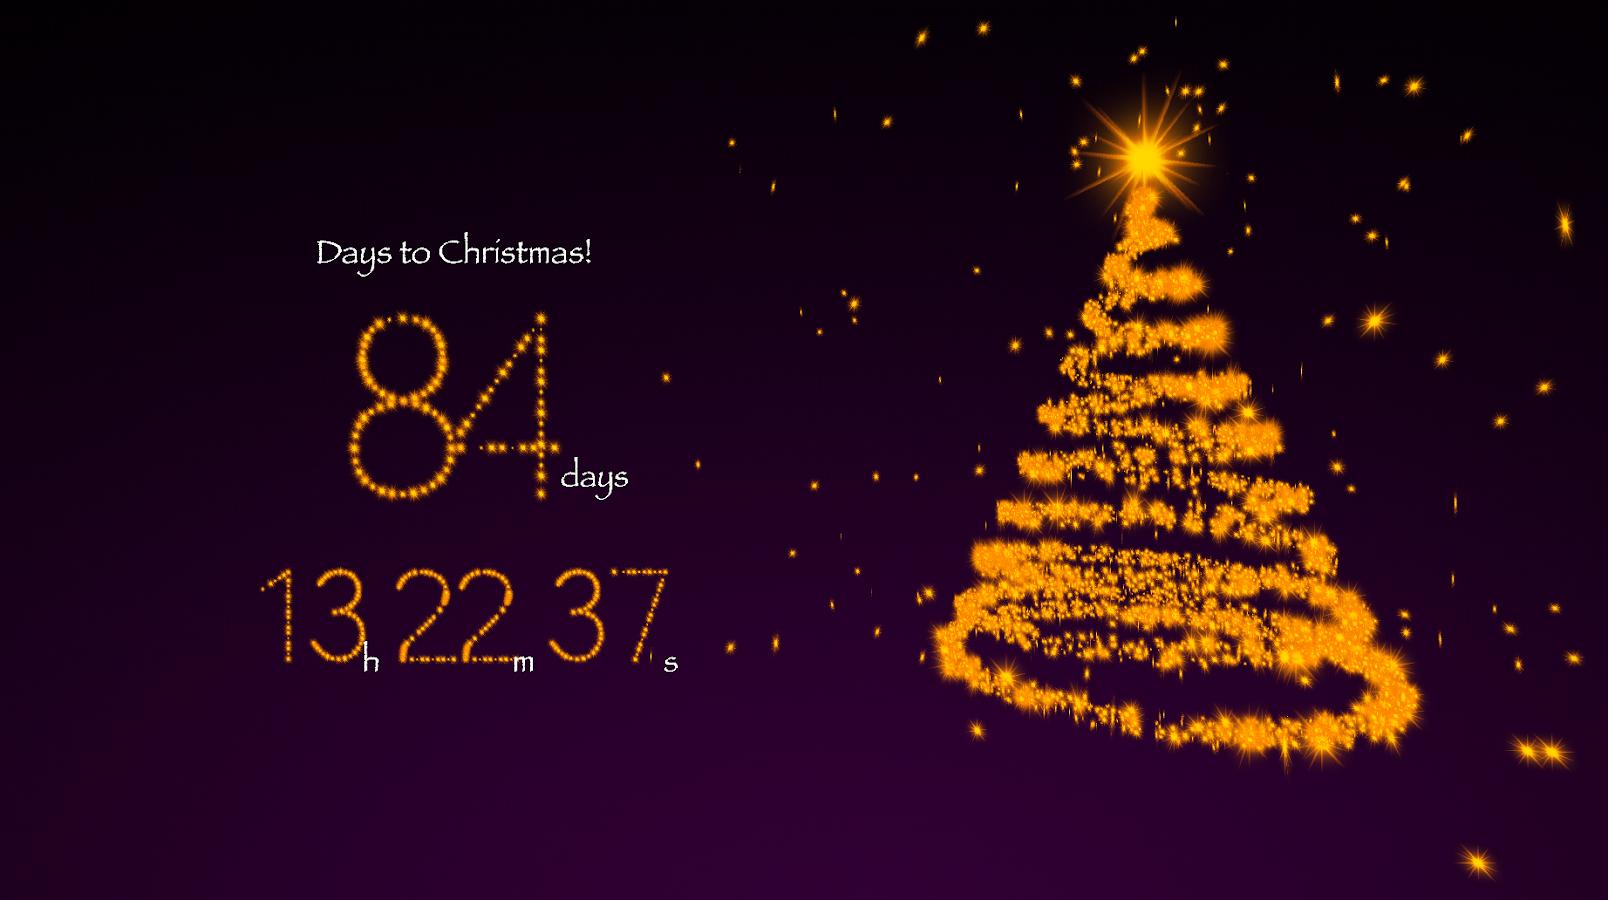 christmas countdown desktop wallpaper 2012